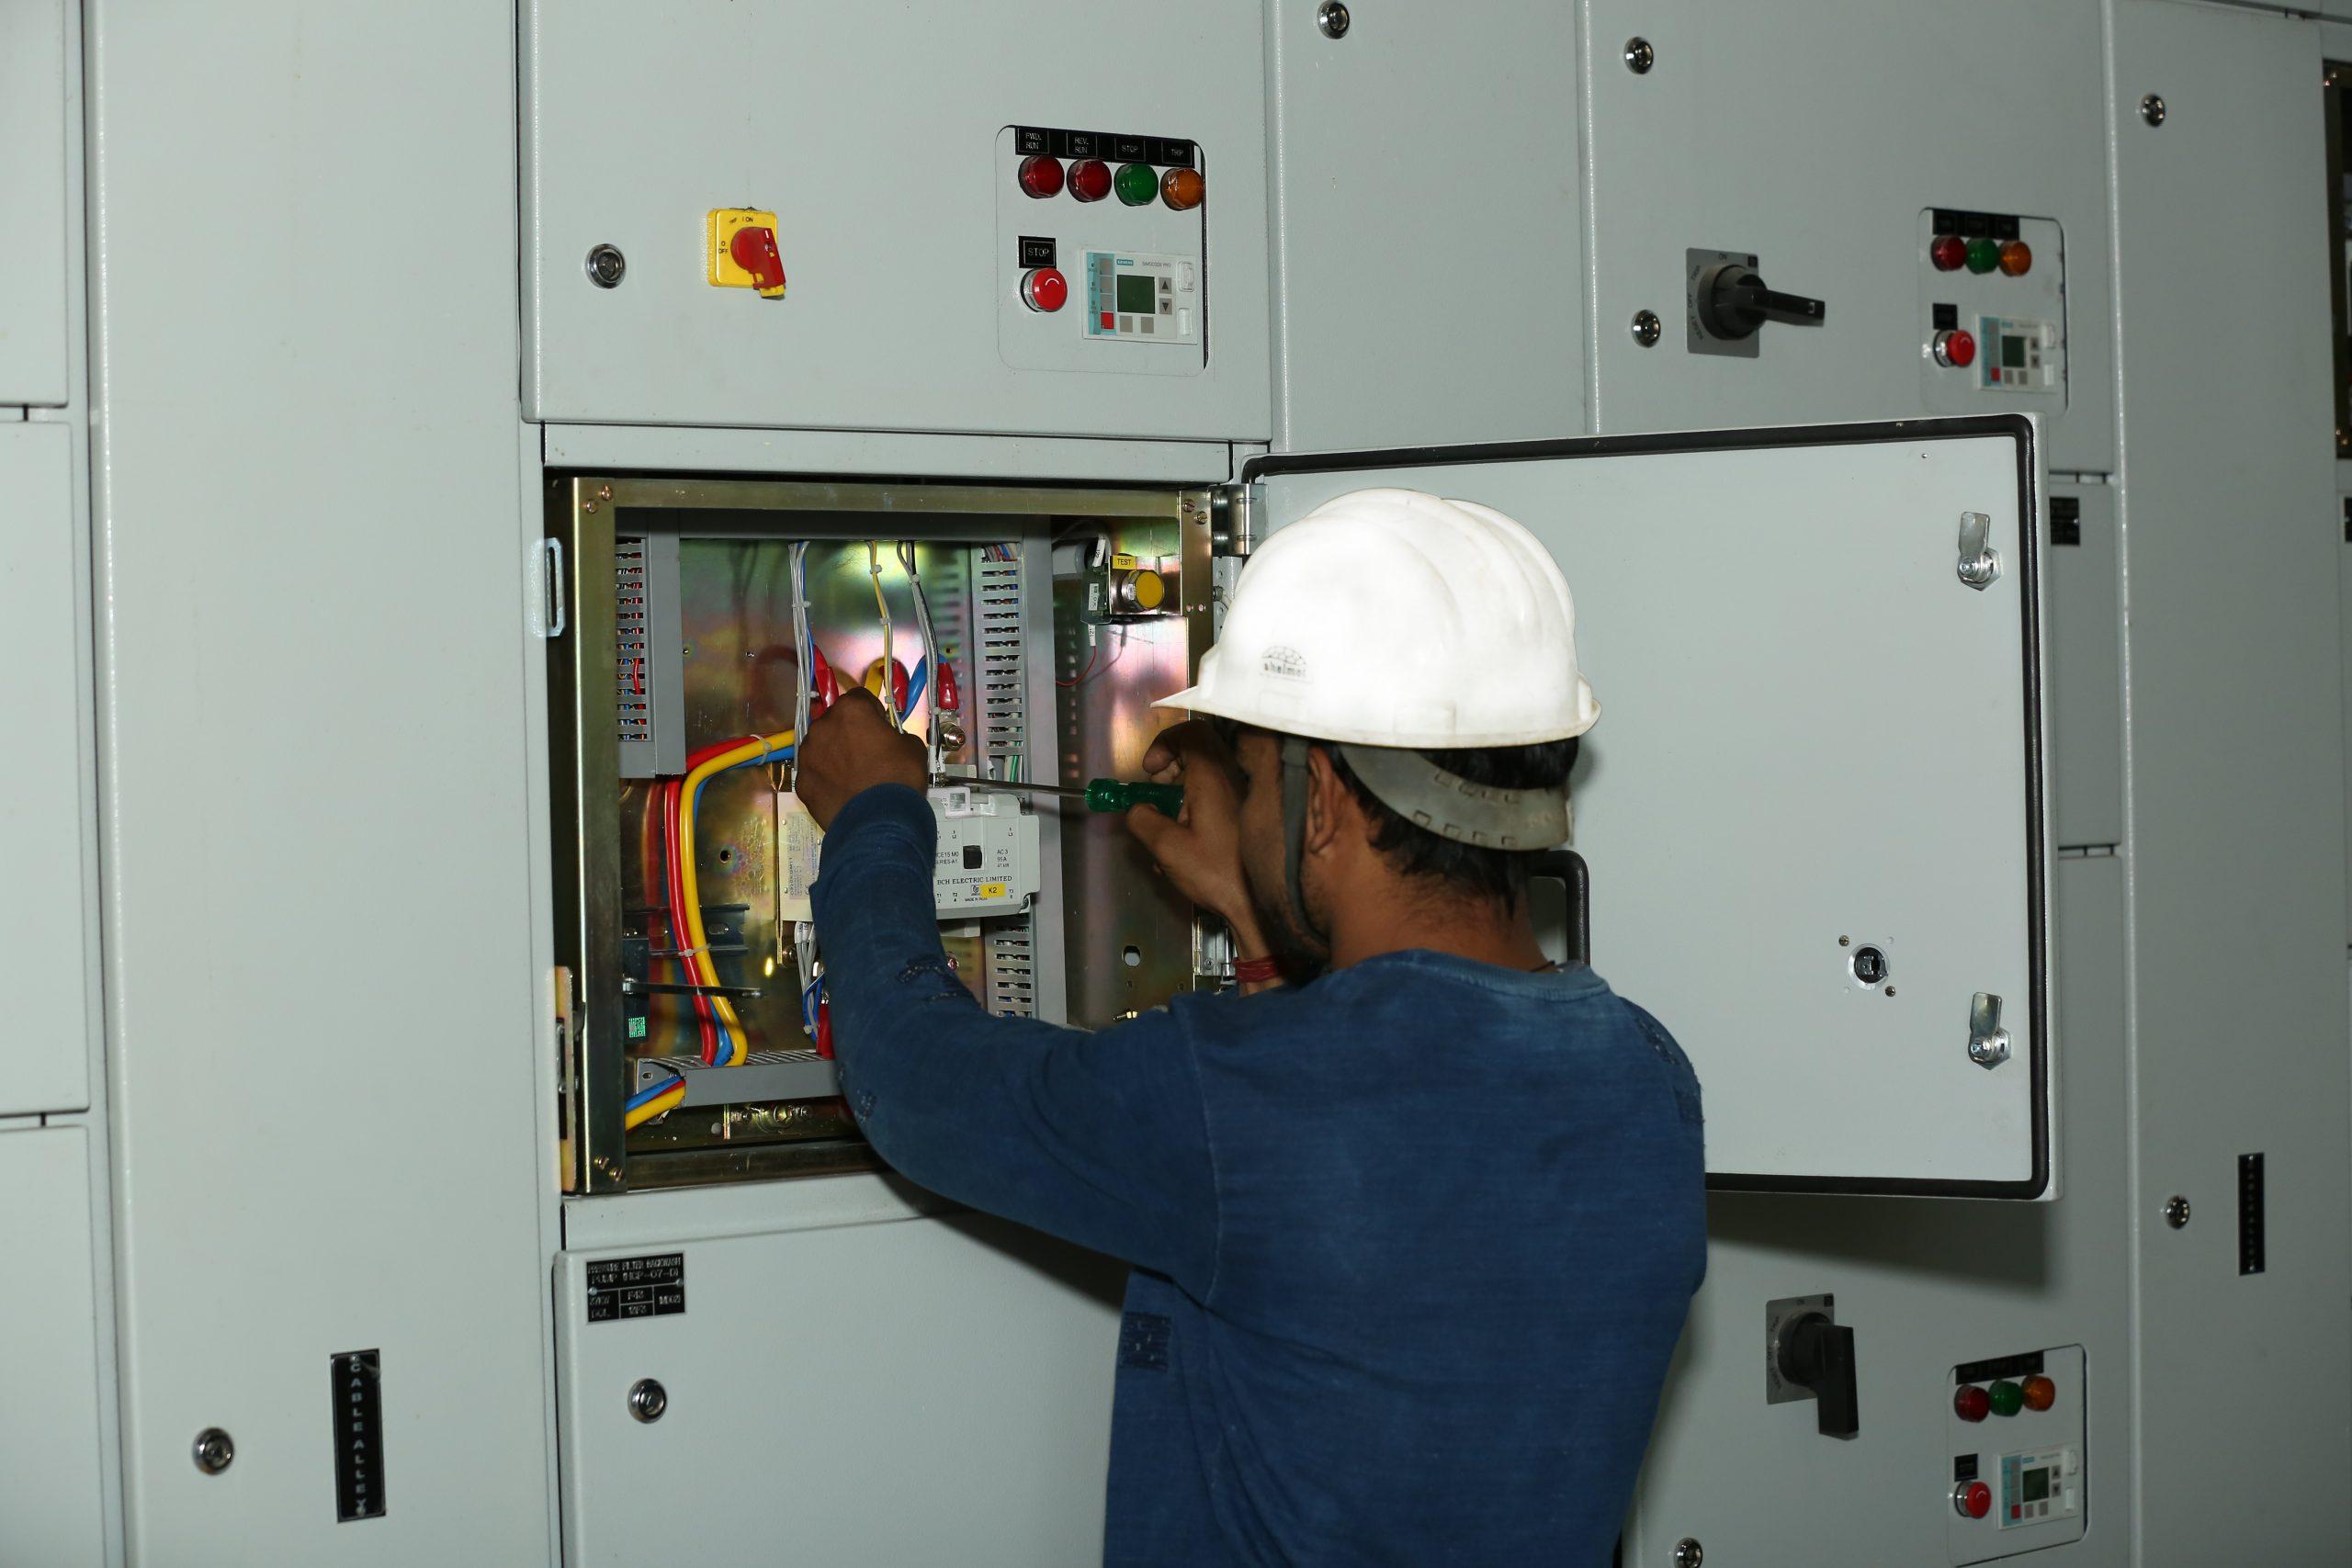 Electrical enclosure